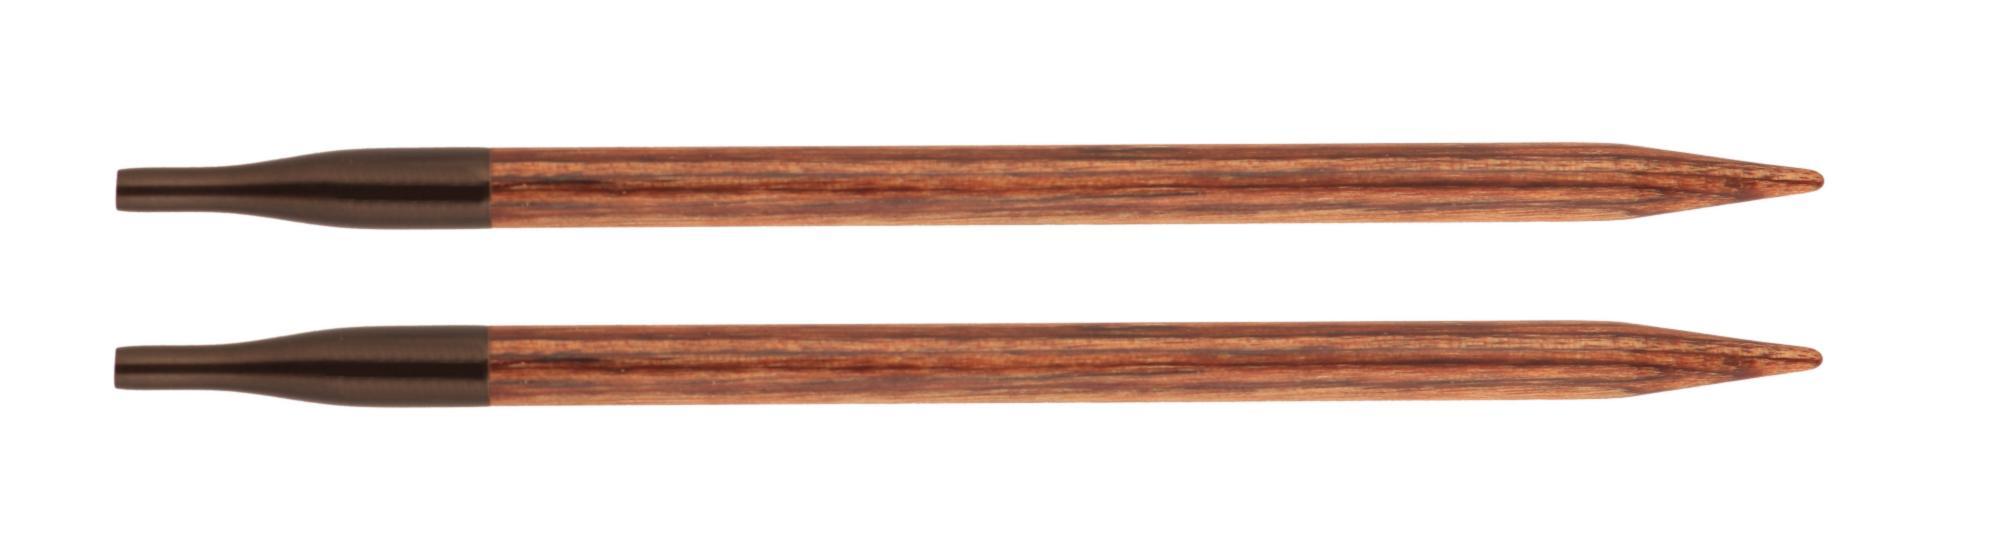 31234 Спицы съемные короткие 10.00 мм Ginger KnitPro